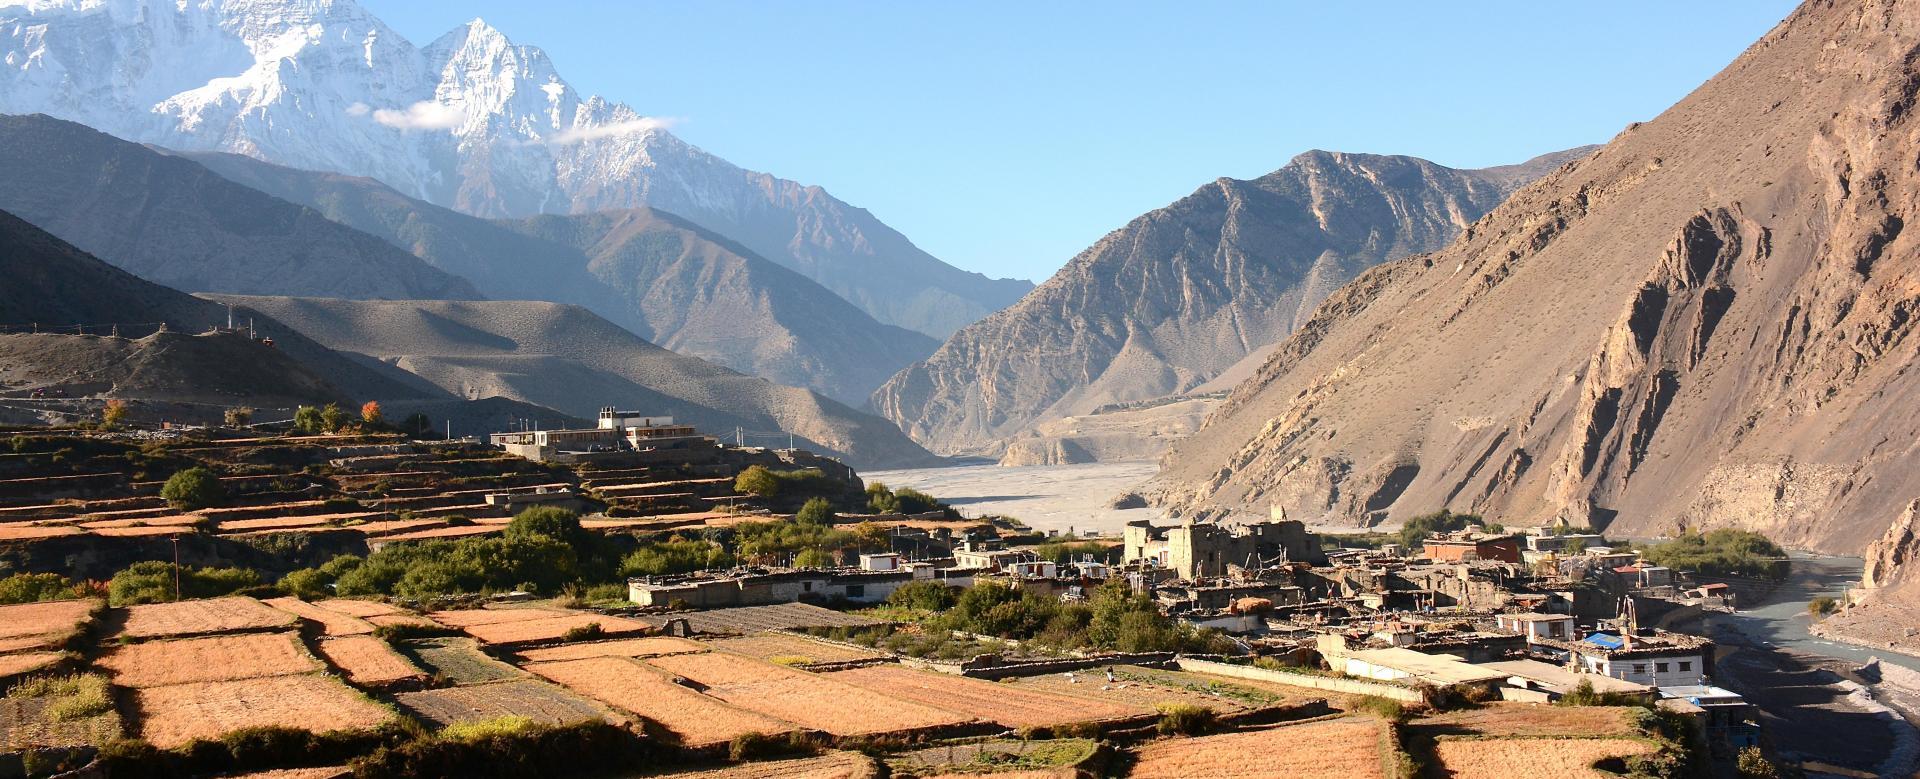 Voyage à pied Nepal : Royaume du mustang et lo manthang